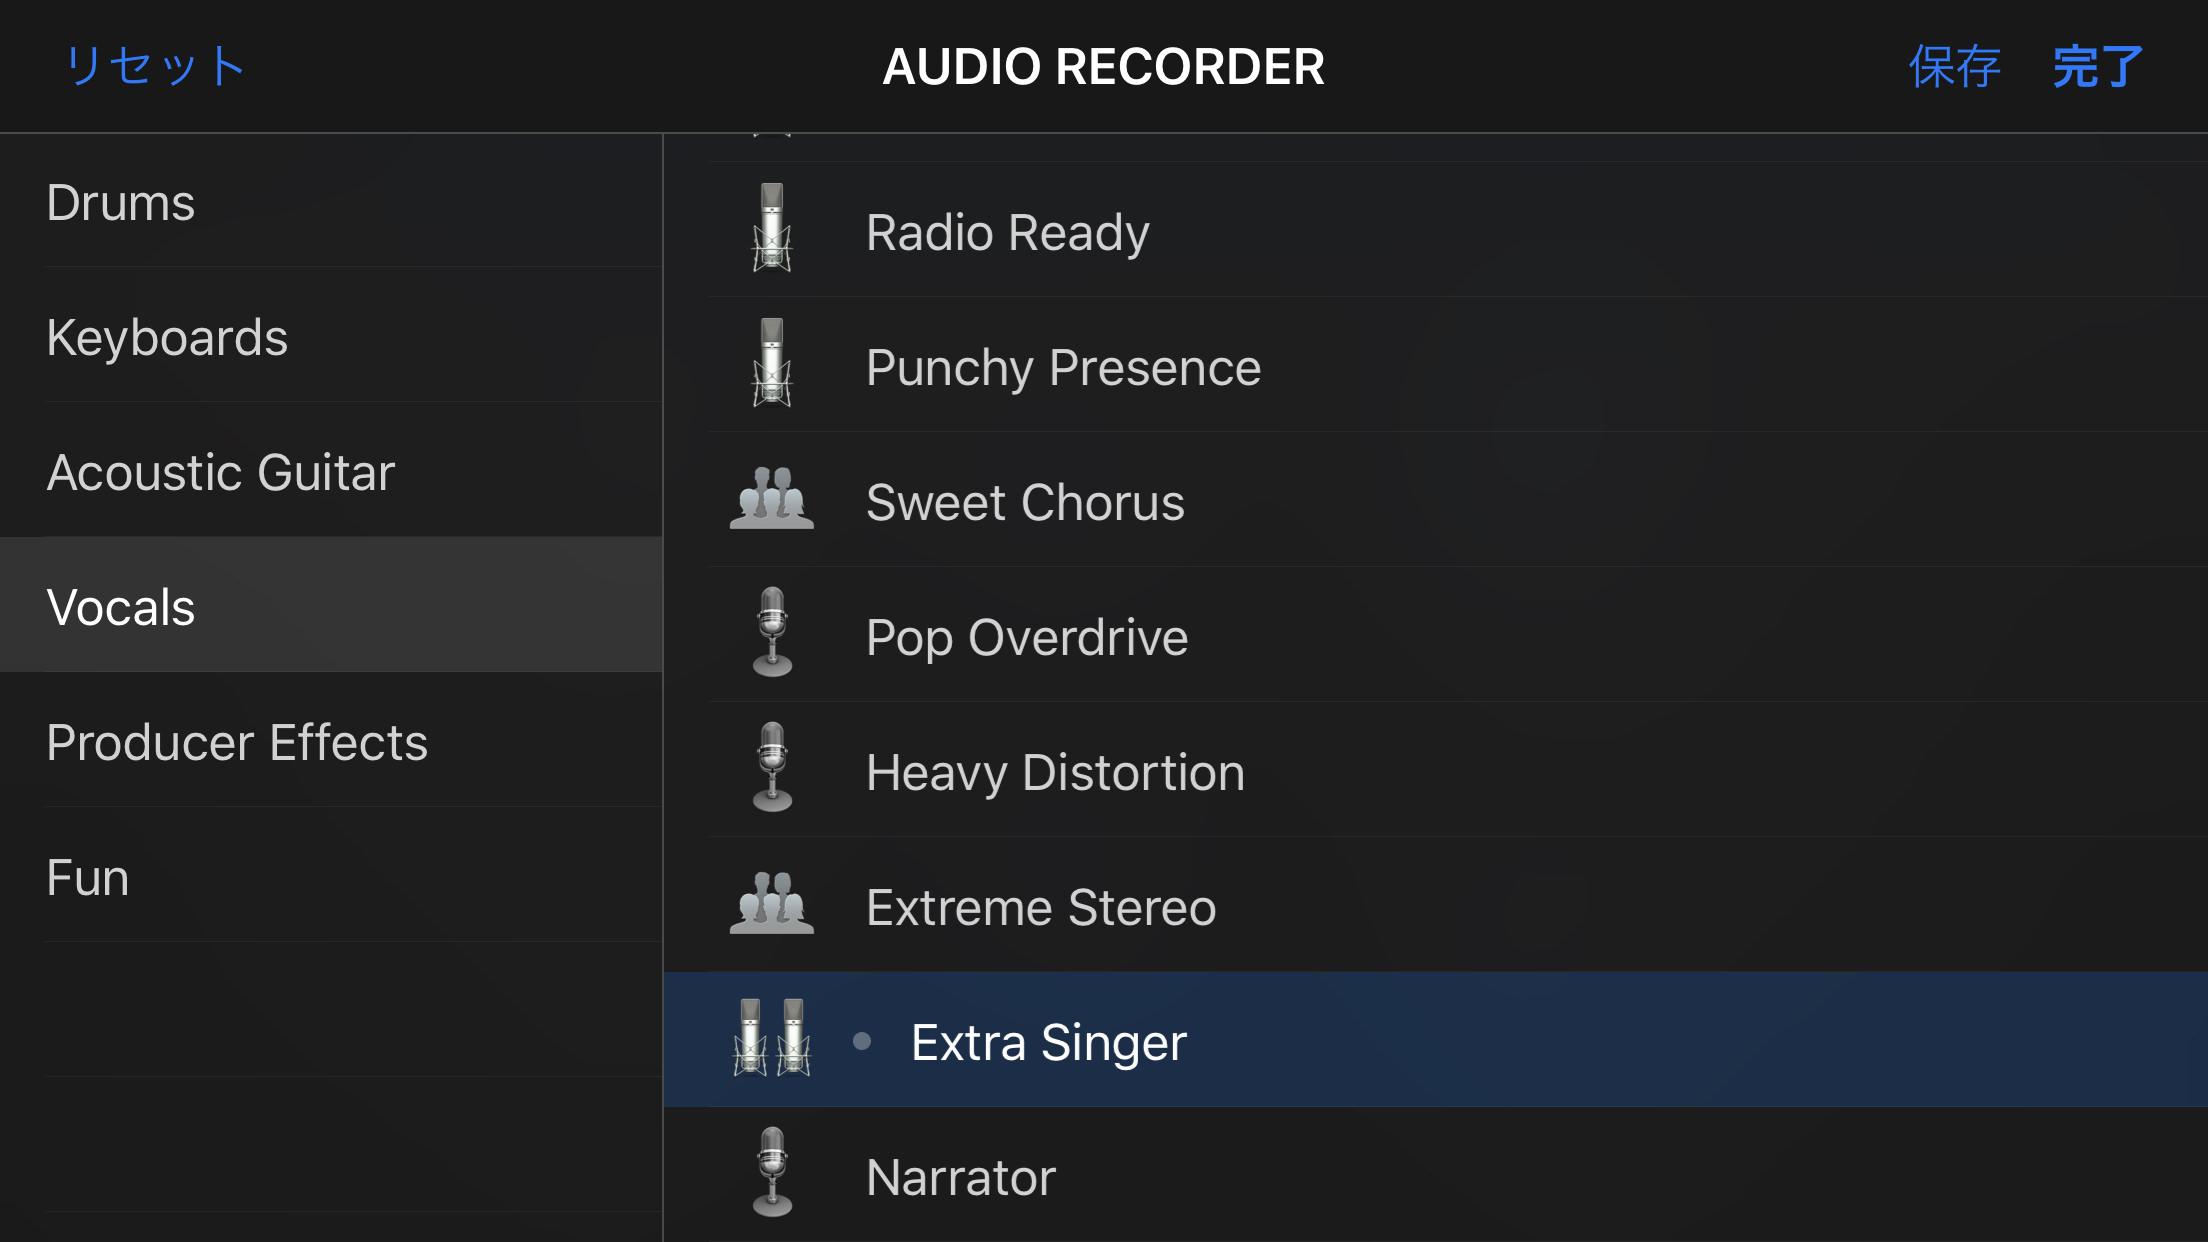 Extra Singer1